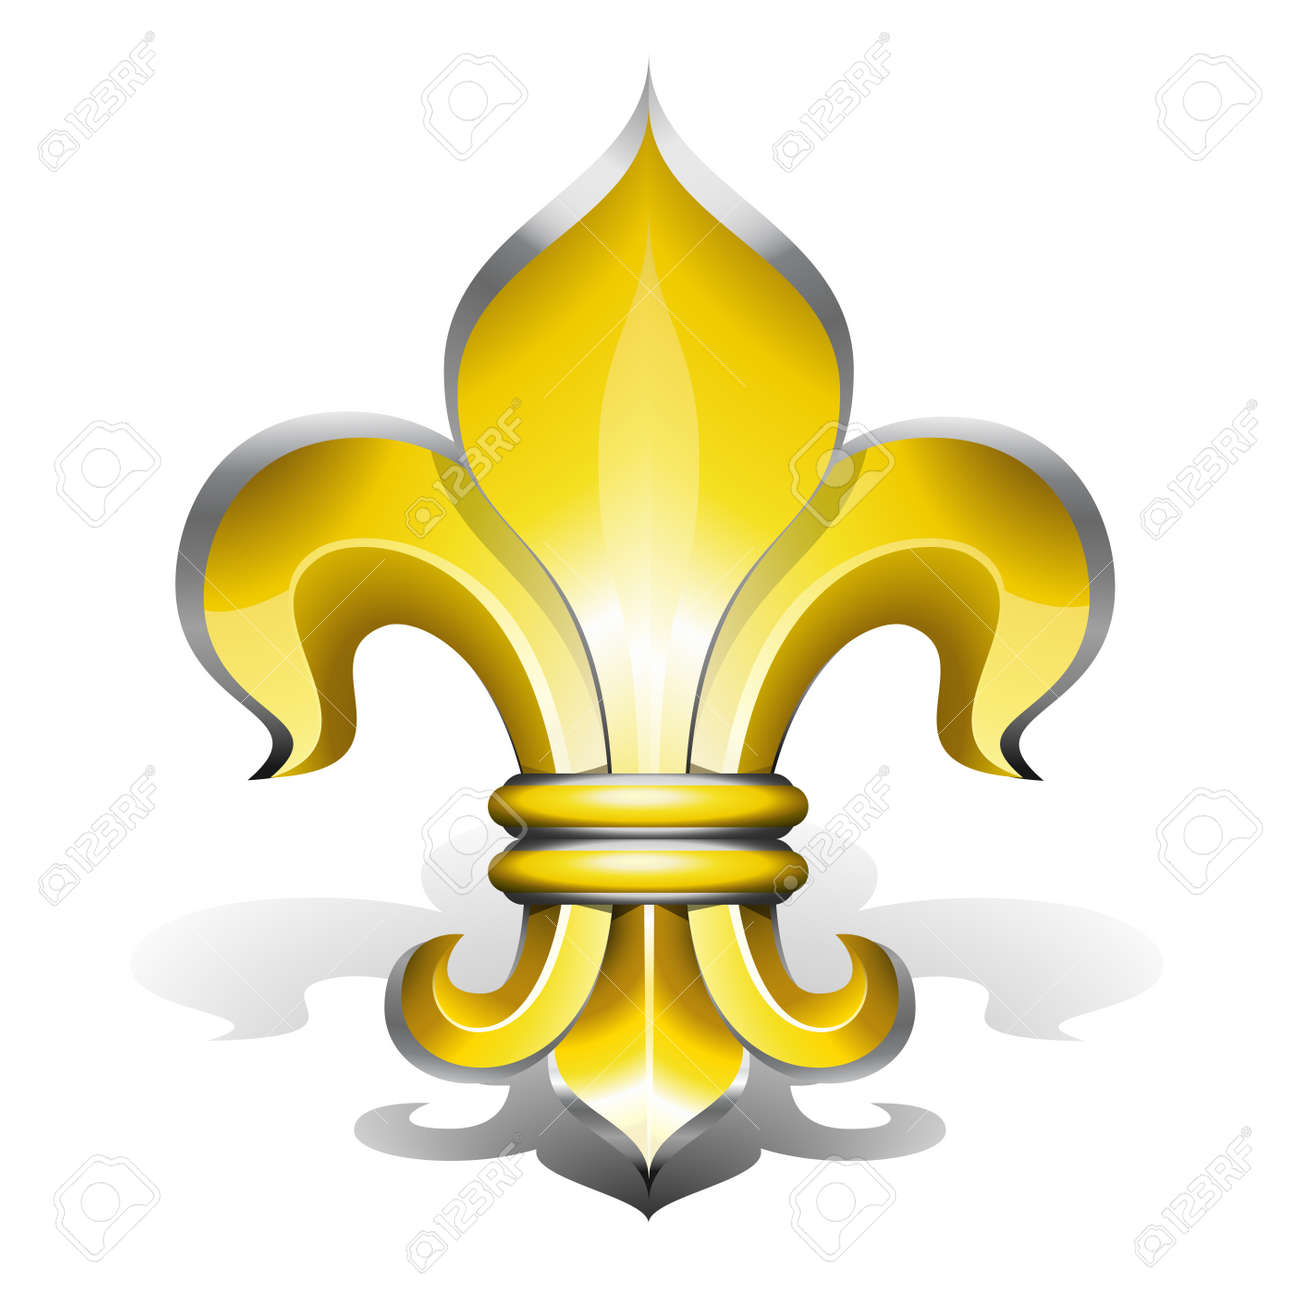 Fleur de lys antique symbol of french royalty royalty free fleur de lys antique symbol of french royalty stock vector 8369499 biocorpaavc Gallery